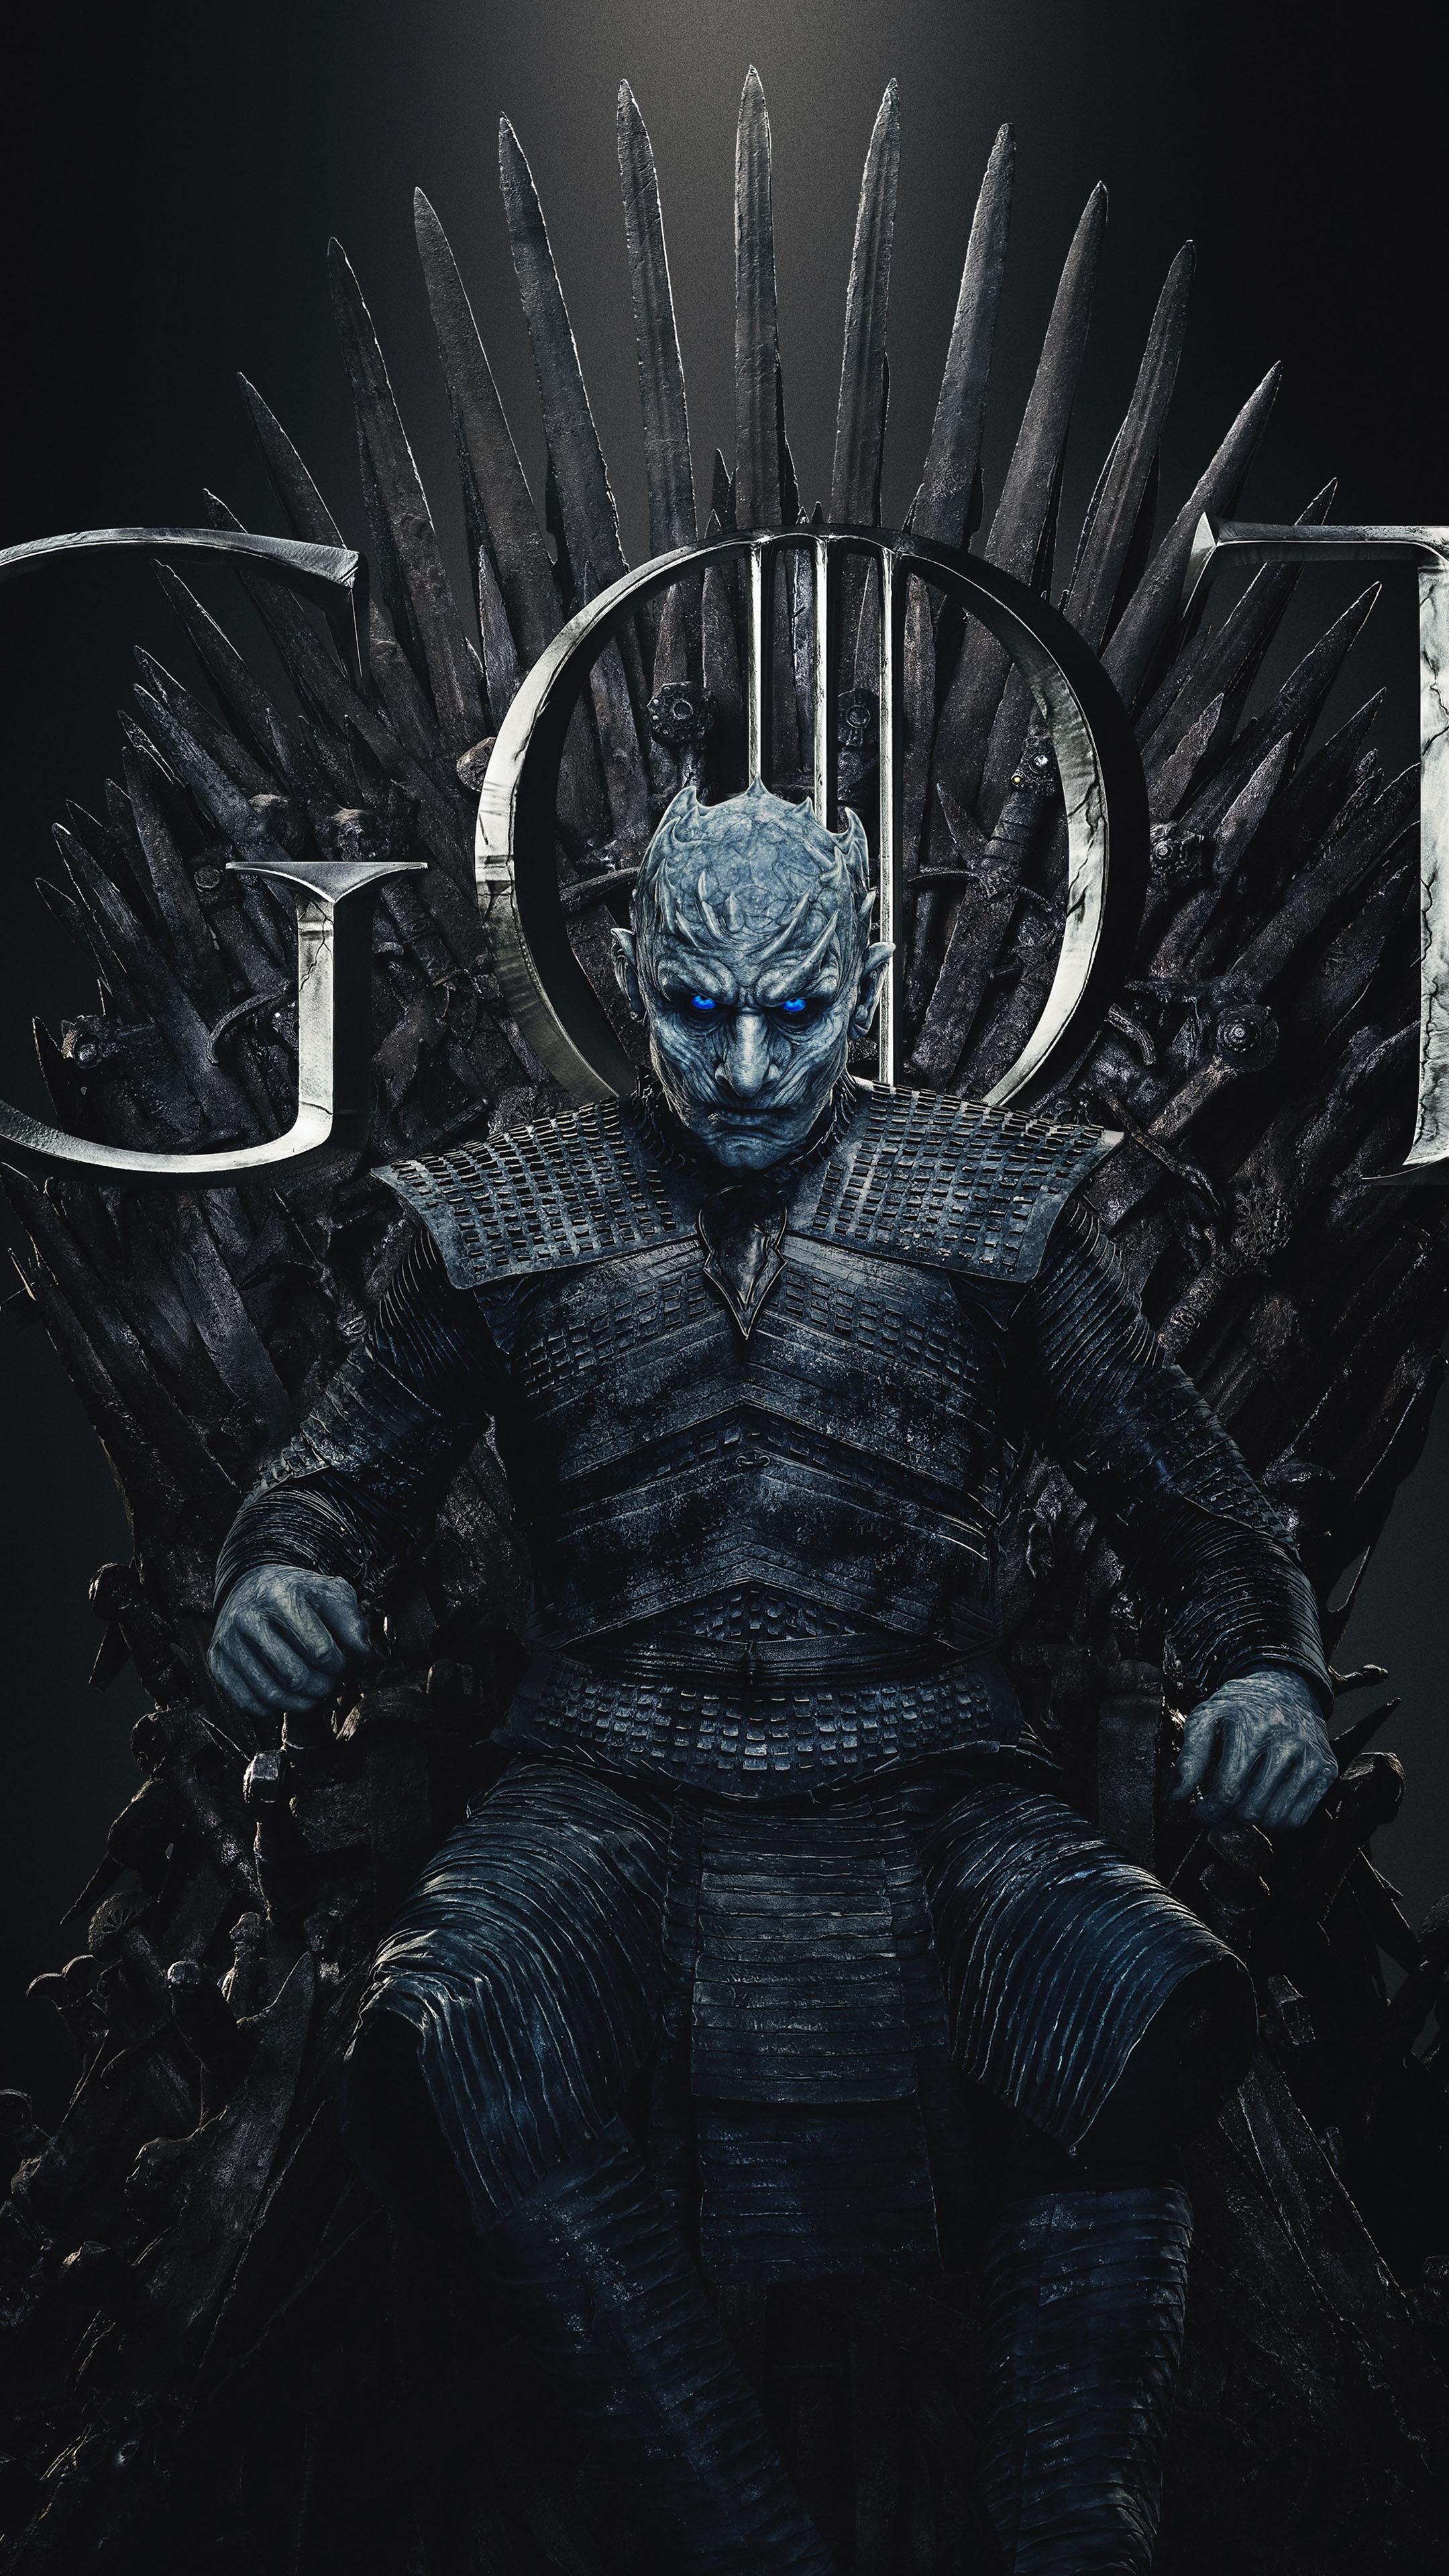 Download Night King Game Of Thrones Season 8 Free Pure 4k Ultra Hd